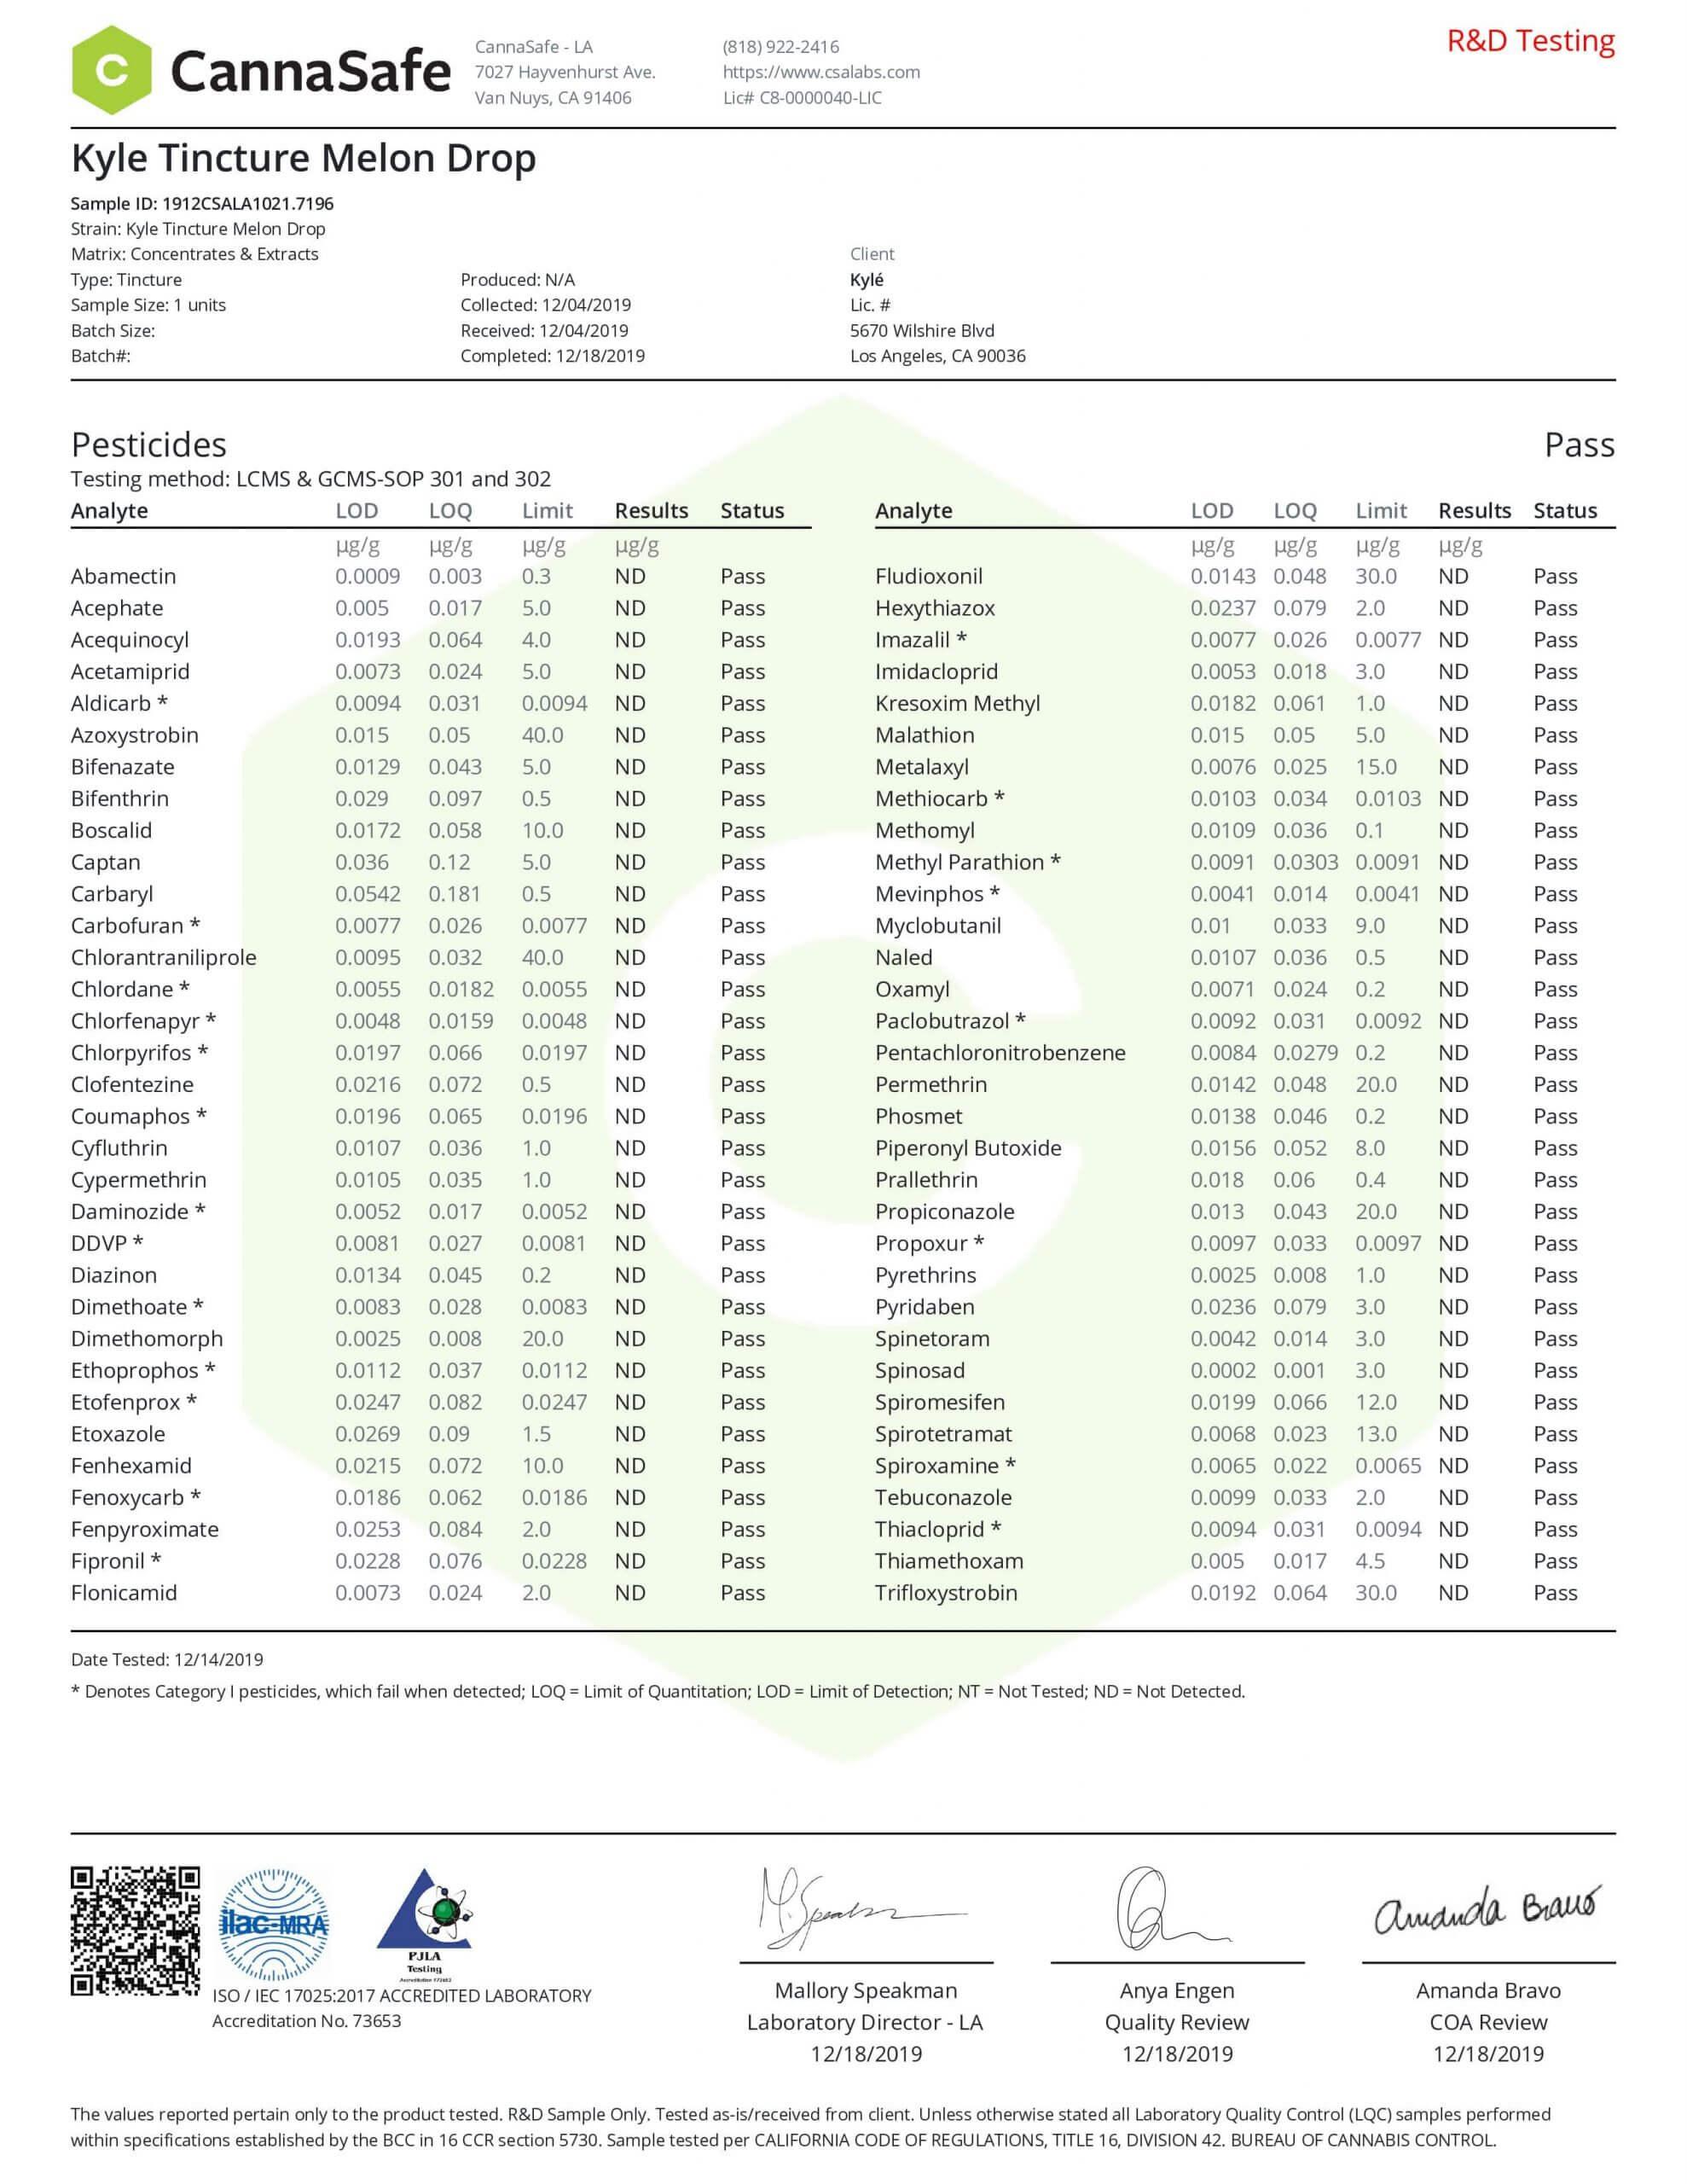 KYLE CBD Gold Melon Drop Lab Report Tincture Oil 1000mg